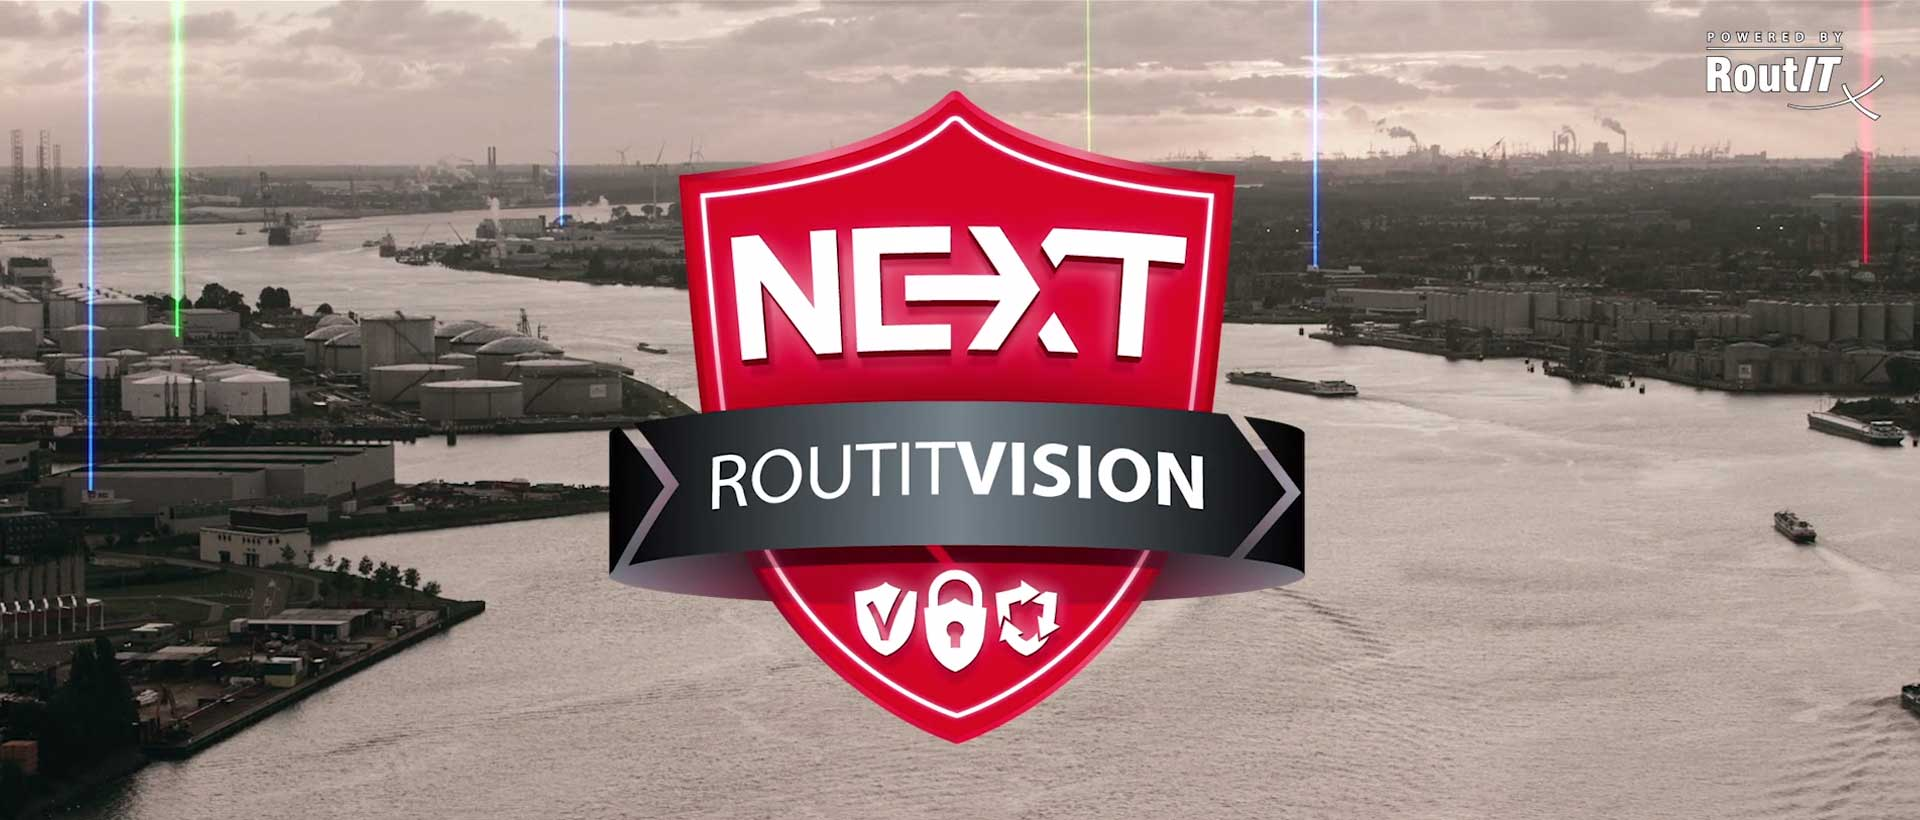 RoutIT Next 6